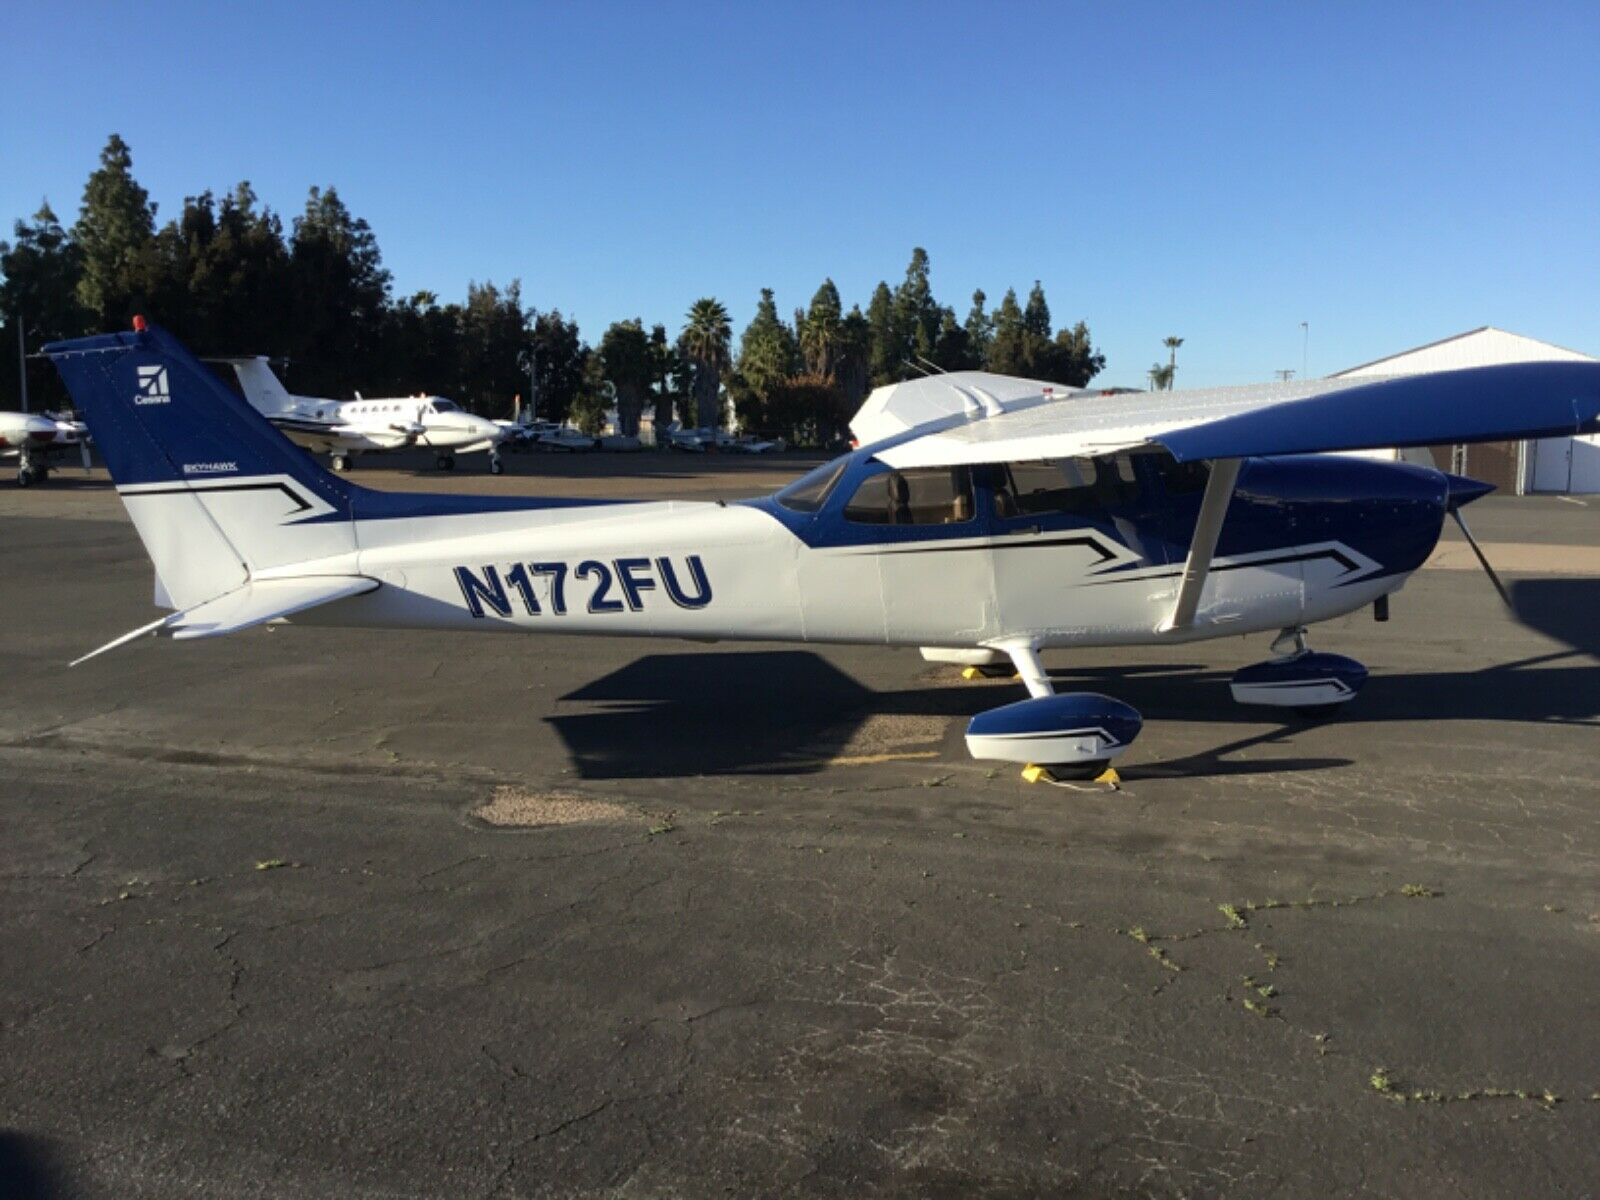 New Paint 2002 Cessna 172r aircraft